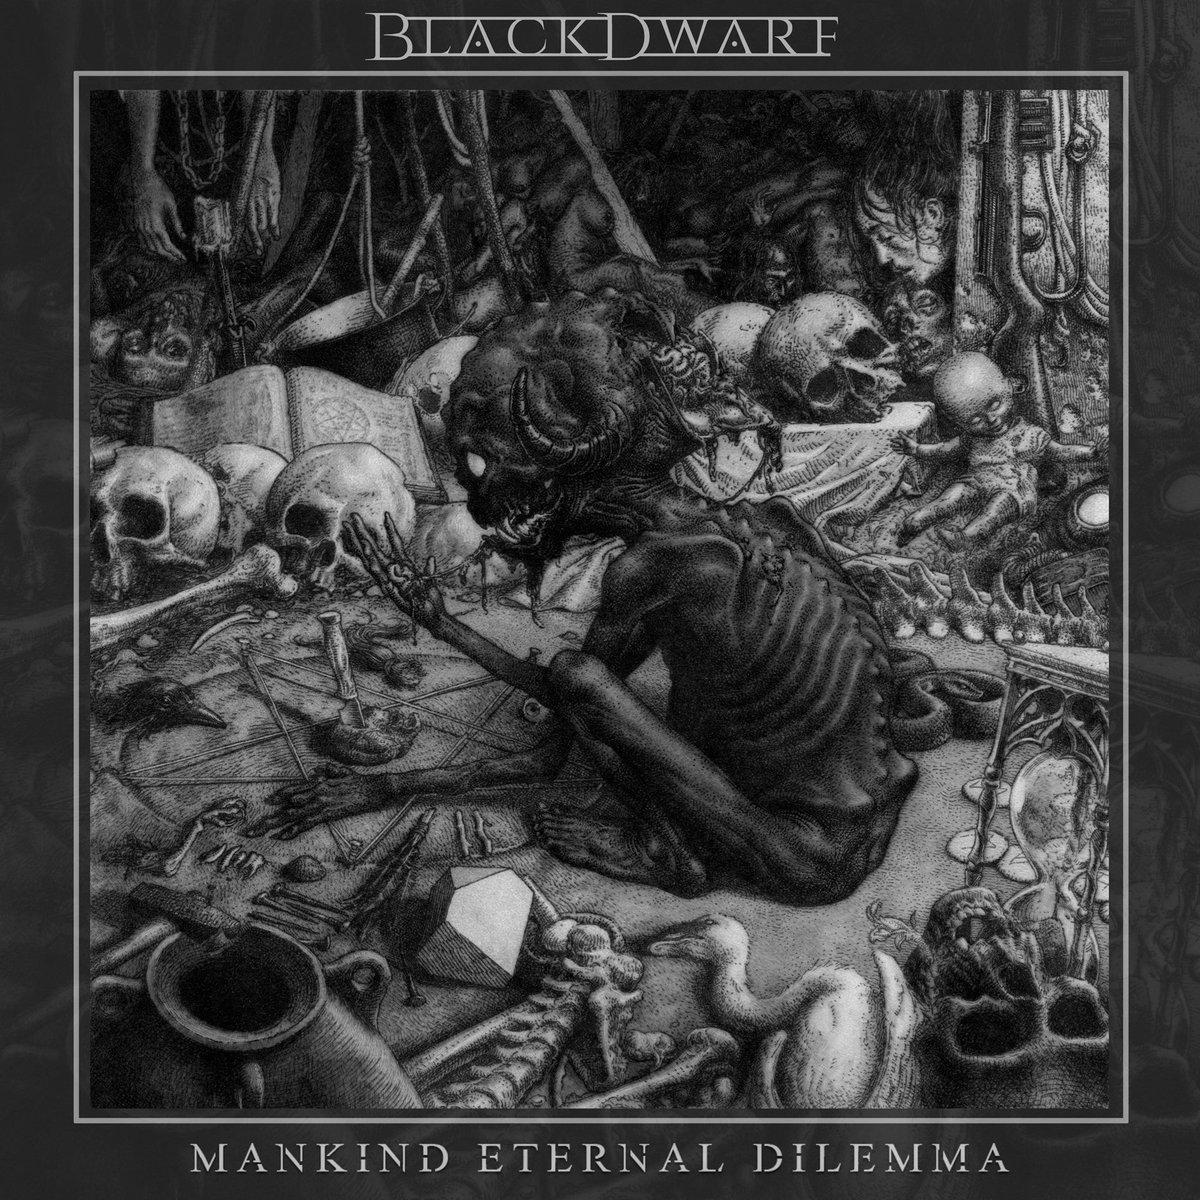 Blackdwarf – Mankind Eternal Dilemma (2019)